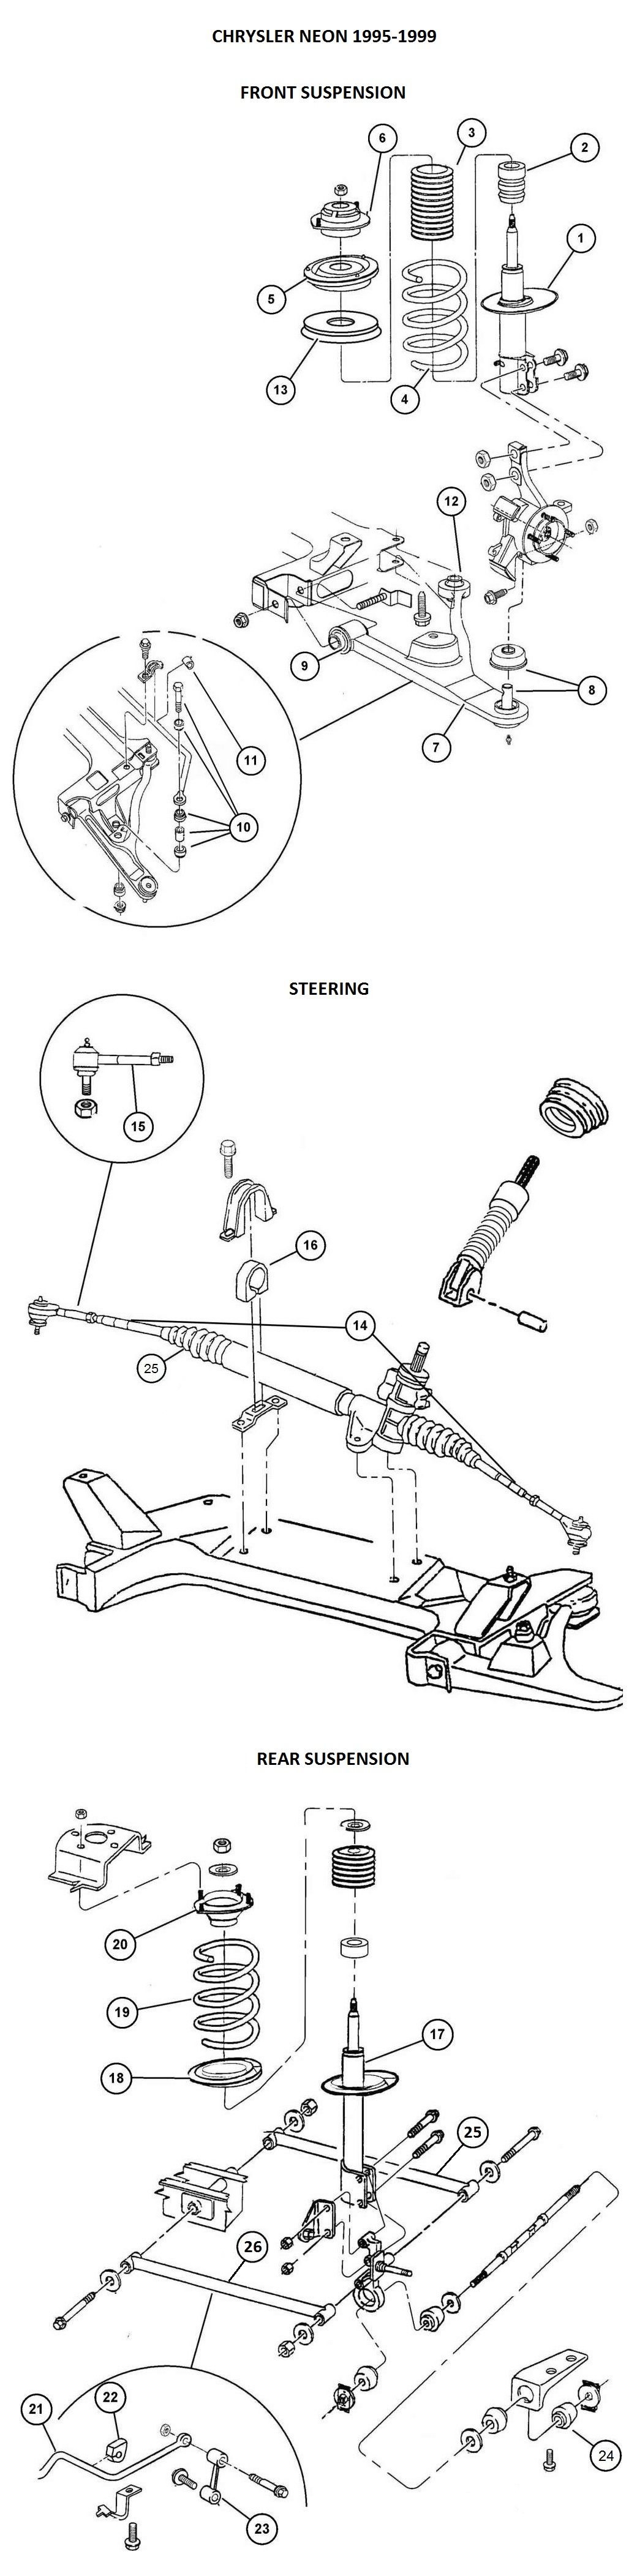 USAuto | Parts for CHRYSLERUSAuto | Parts for CHRYSLER